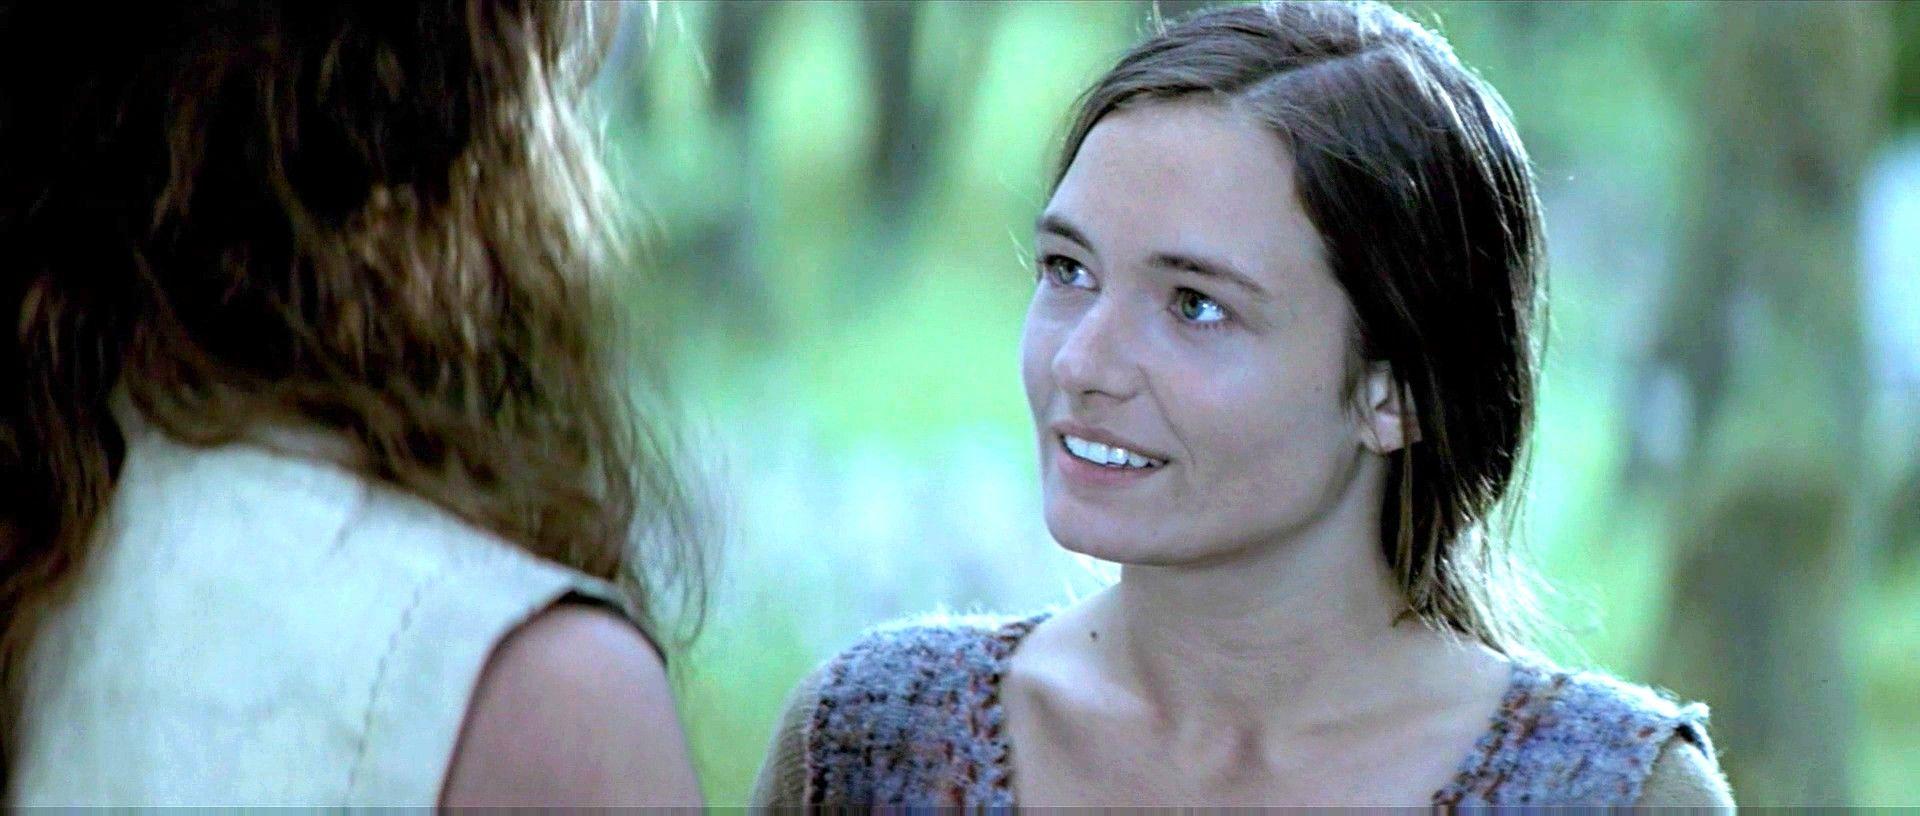 Catherine McCormack (born 1972)